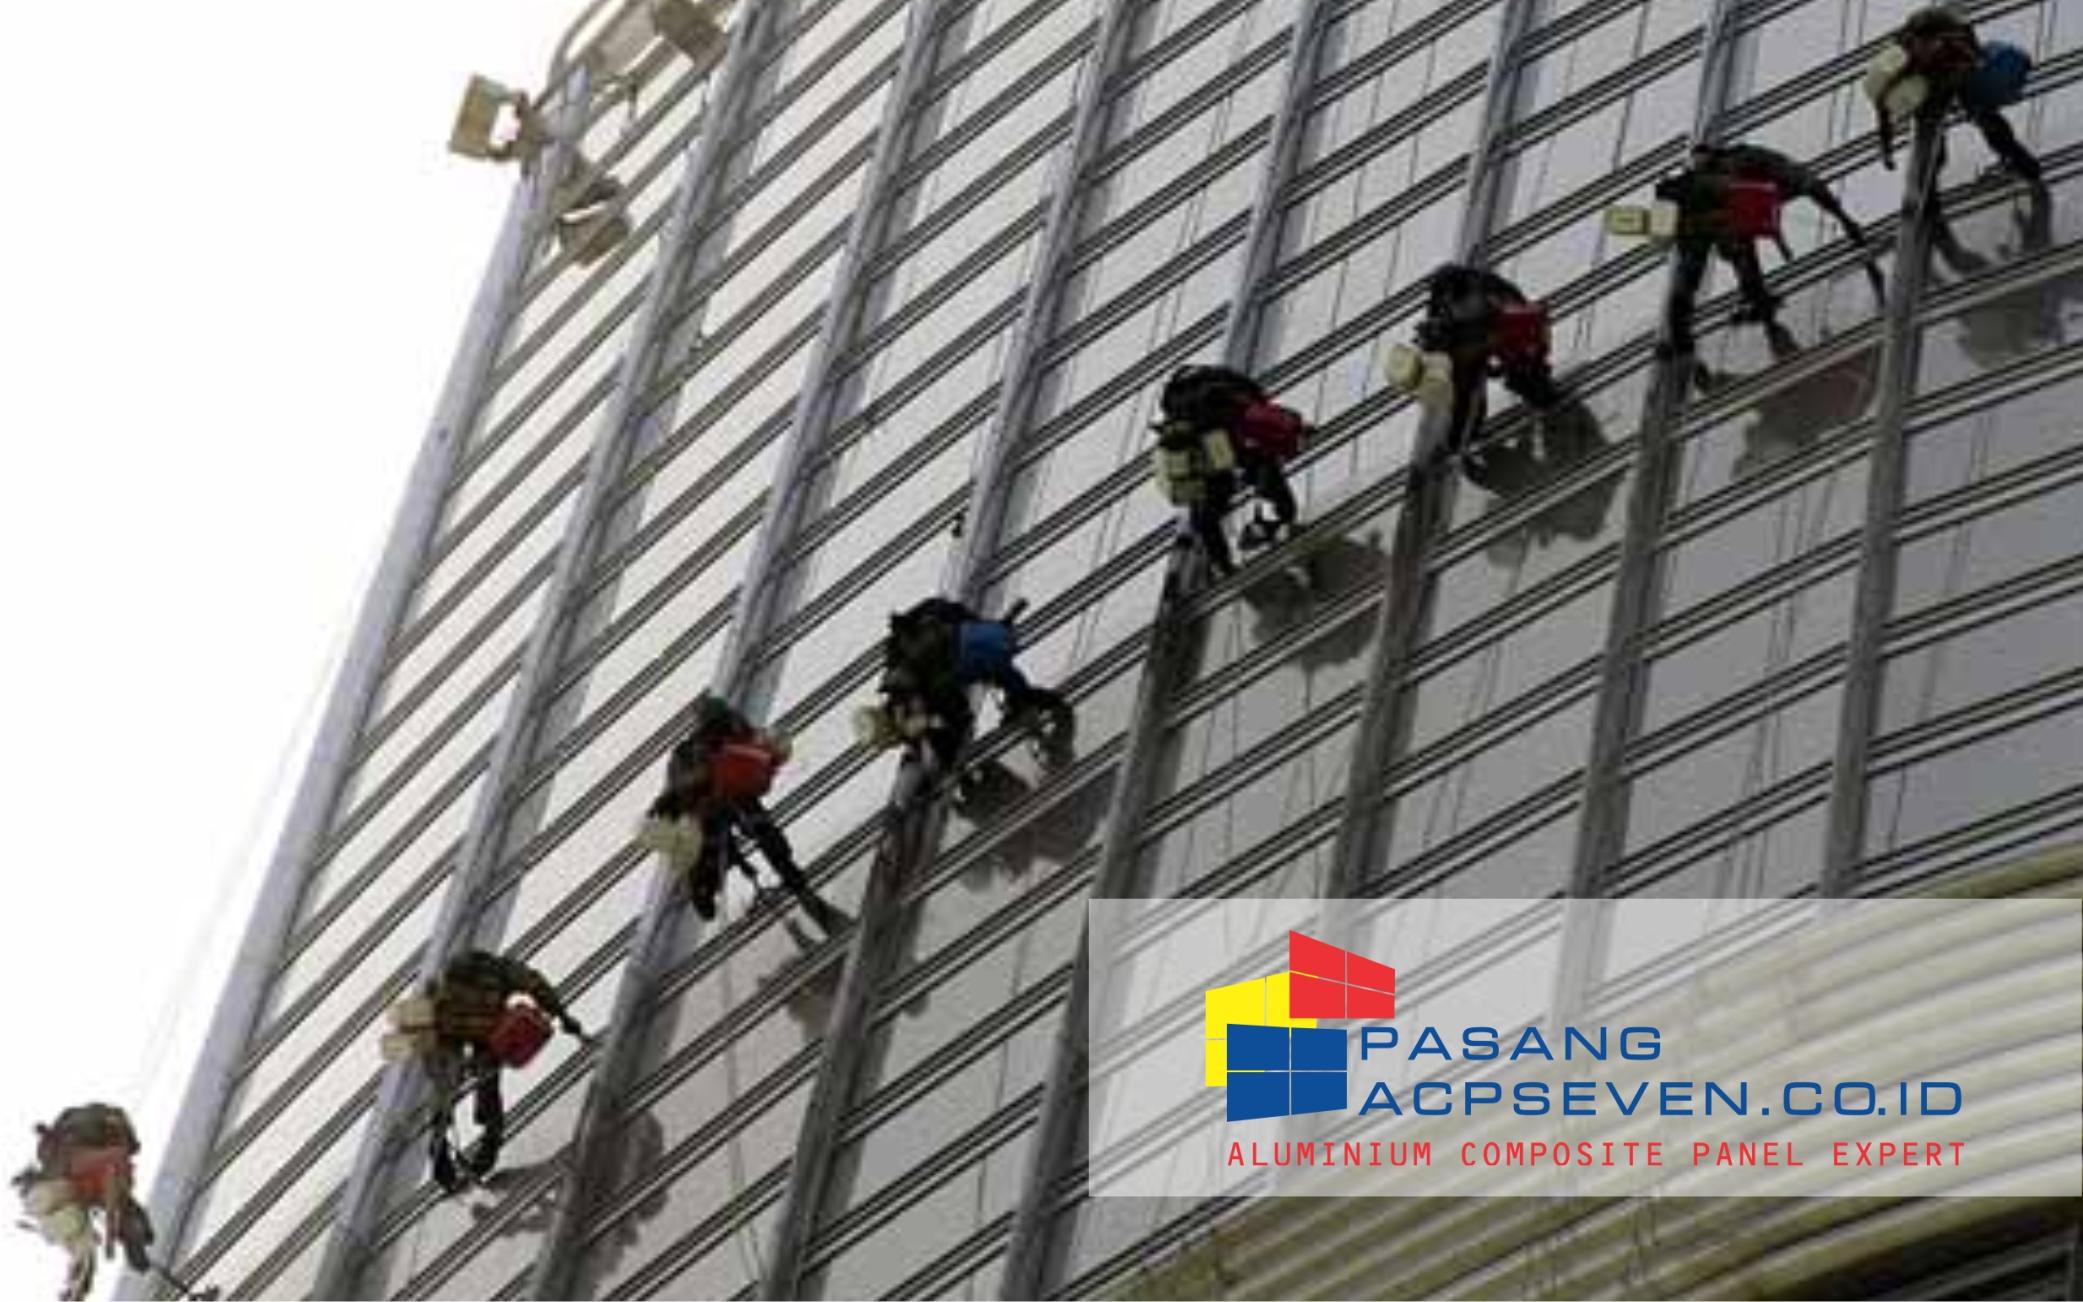 pembersih kaca gedung tinggi surabaya, jasa bersih gedung surabaya, pembersihan acp surabaya